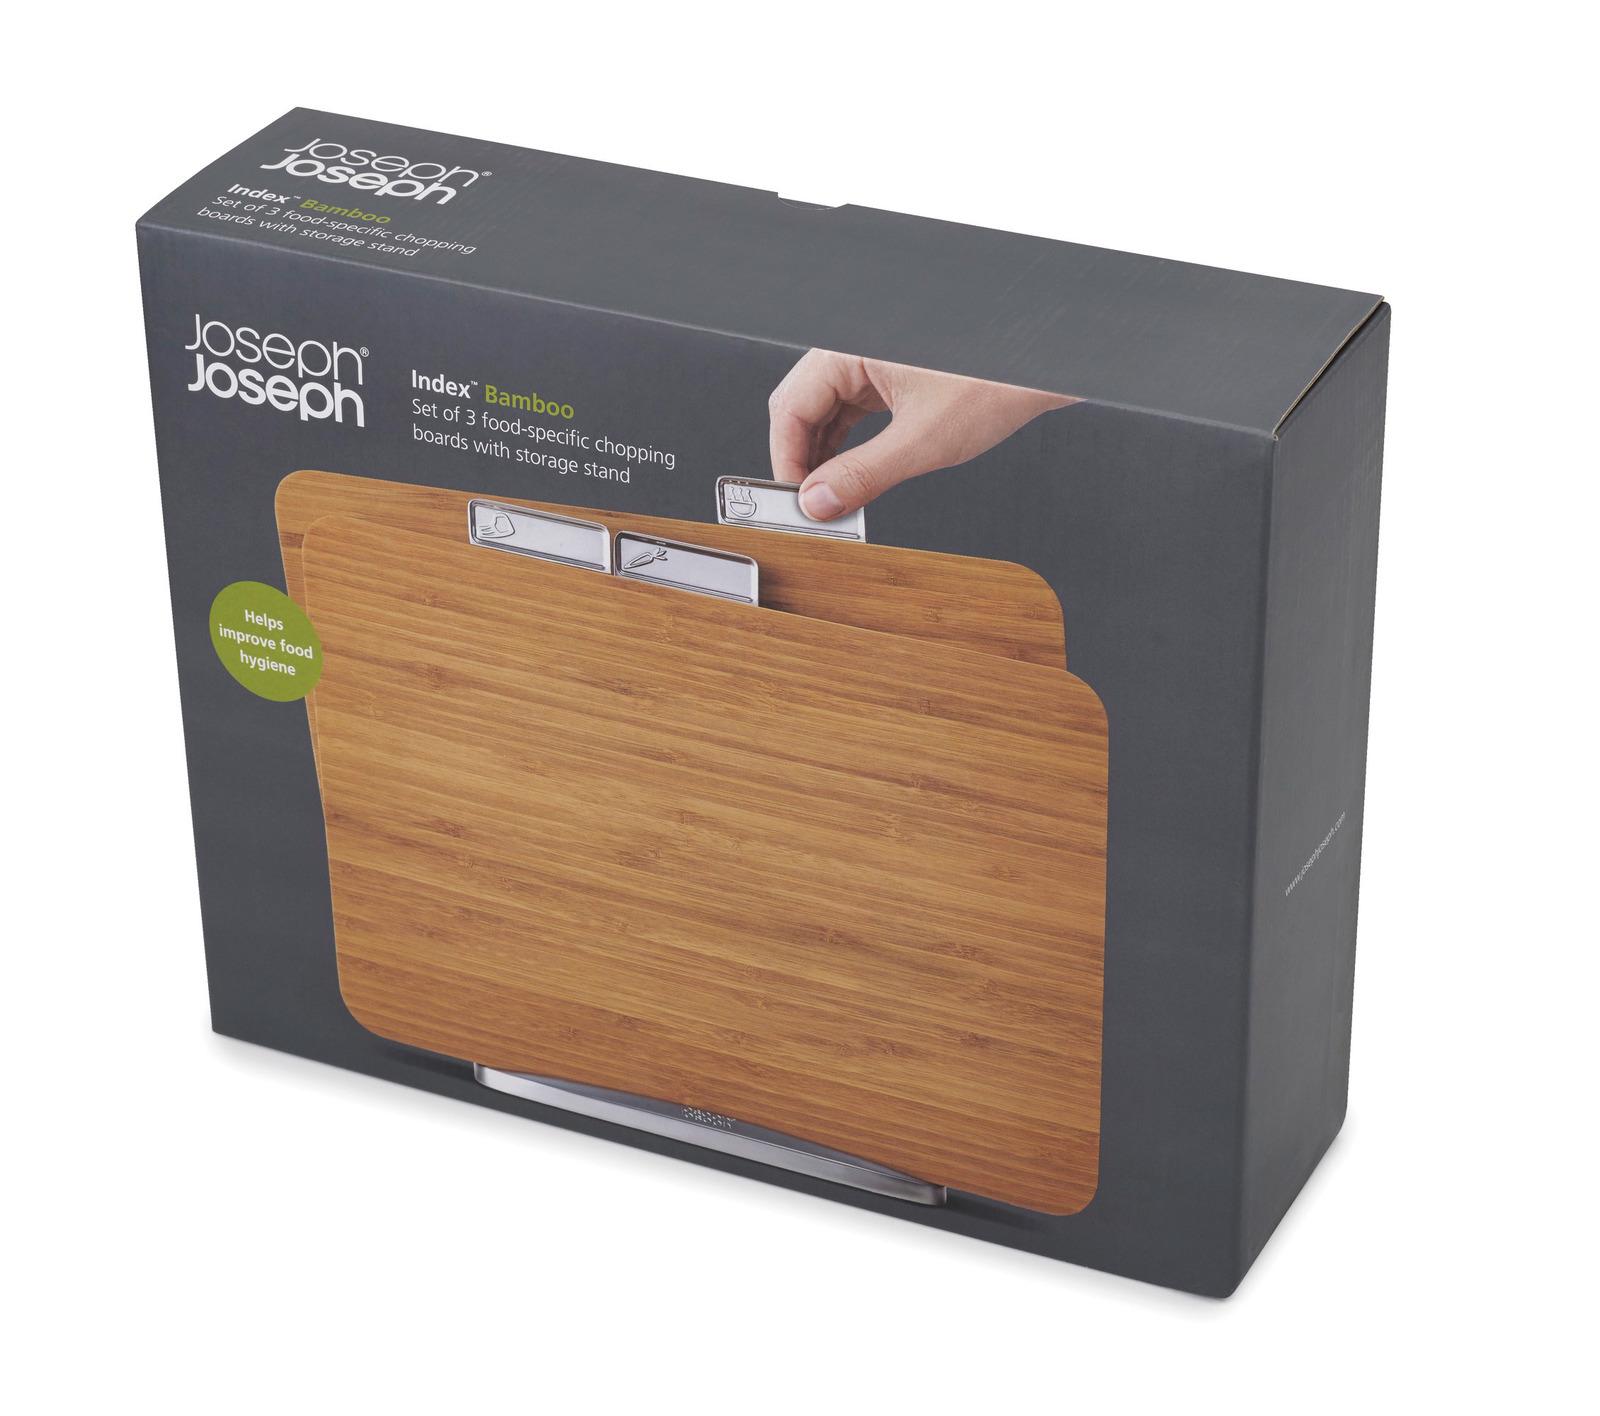 Joseph Joseph Index™ Bamboo image